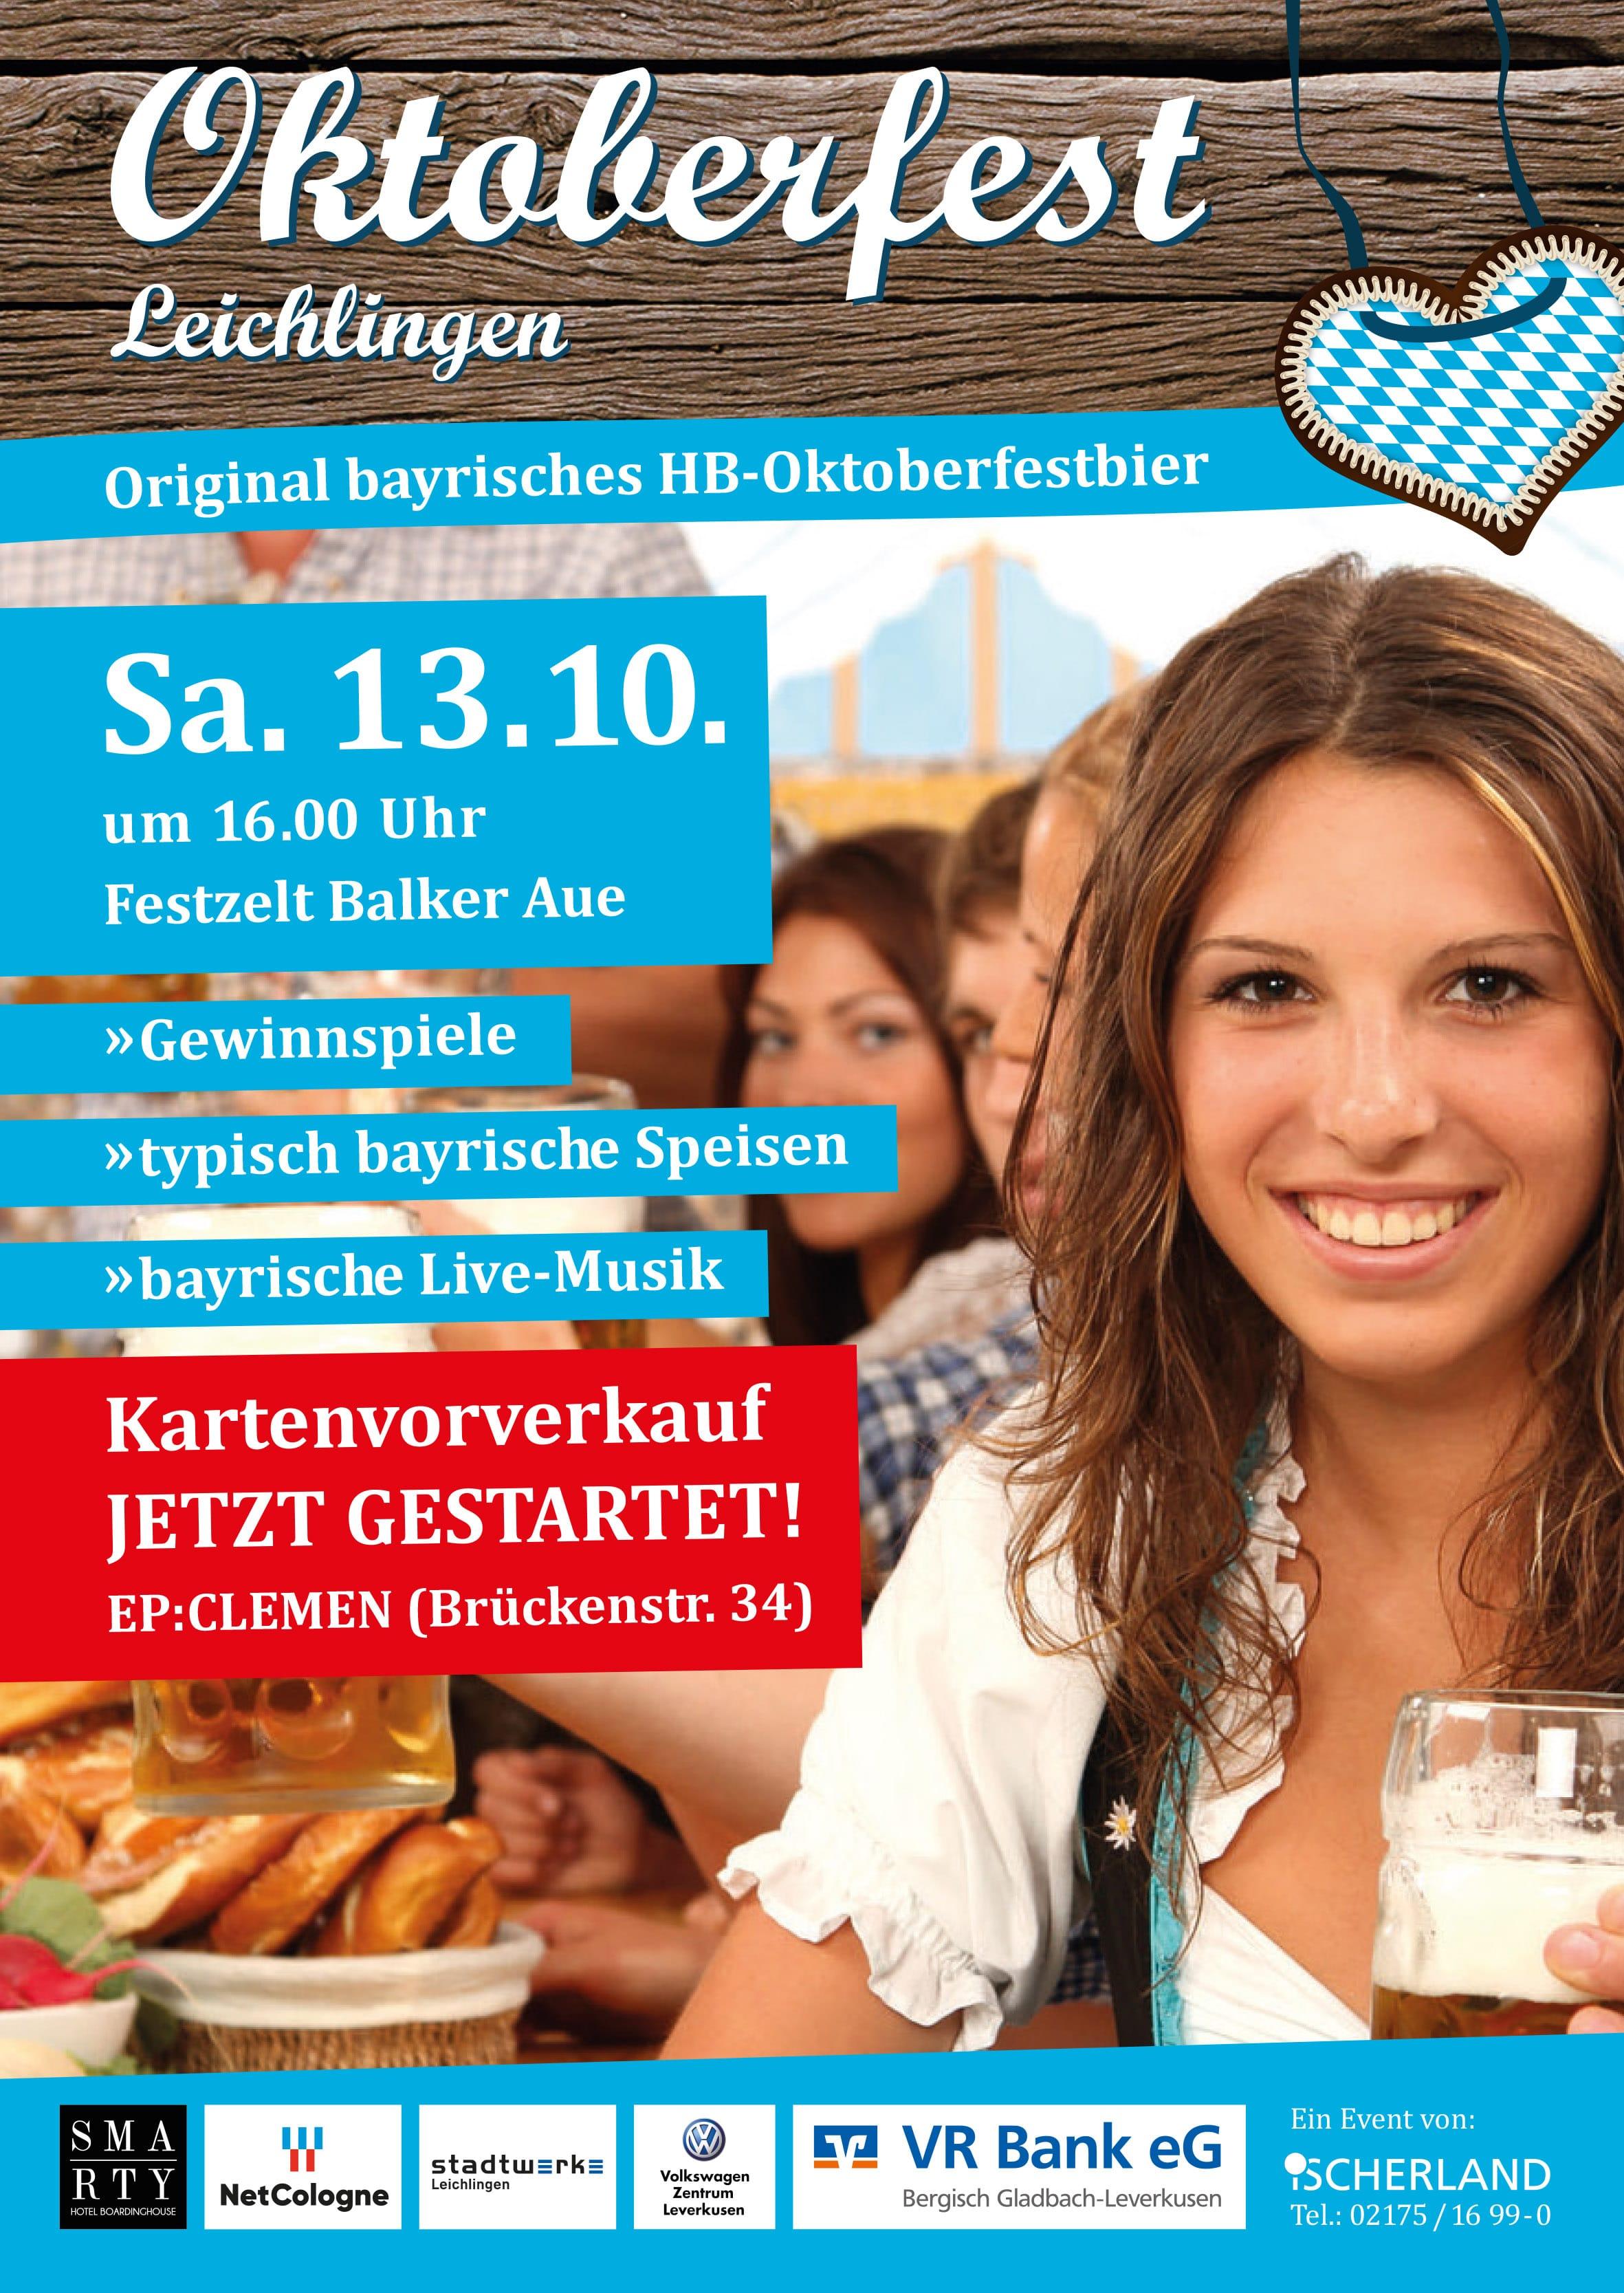 Oktoberfest in Leichlingen